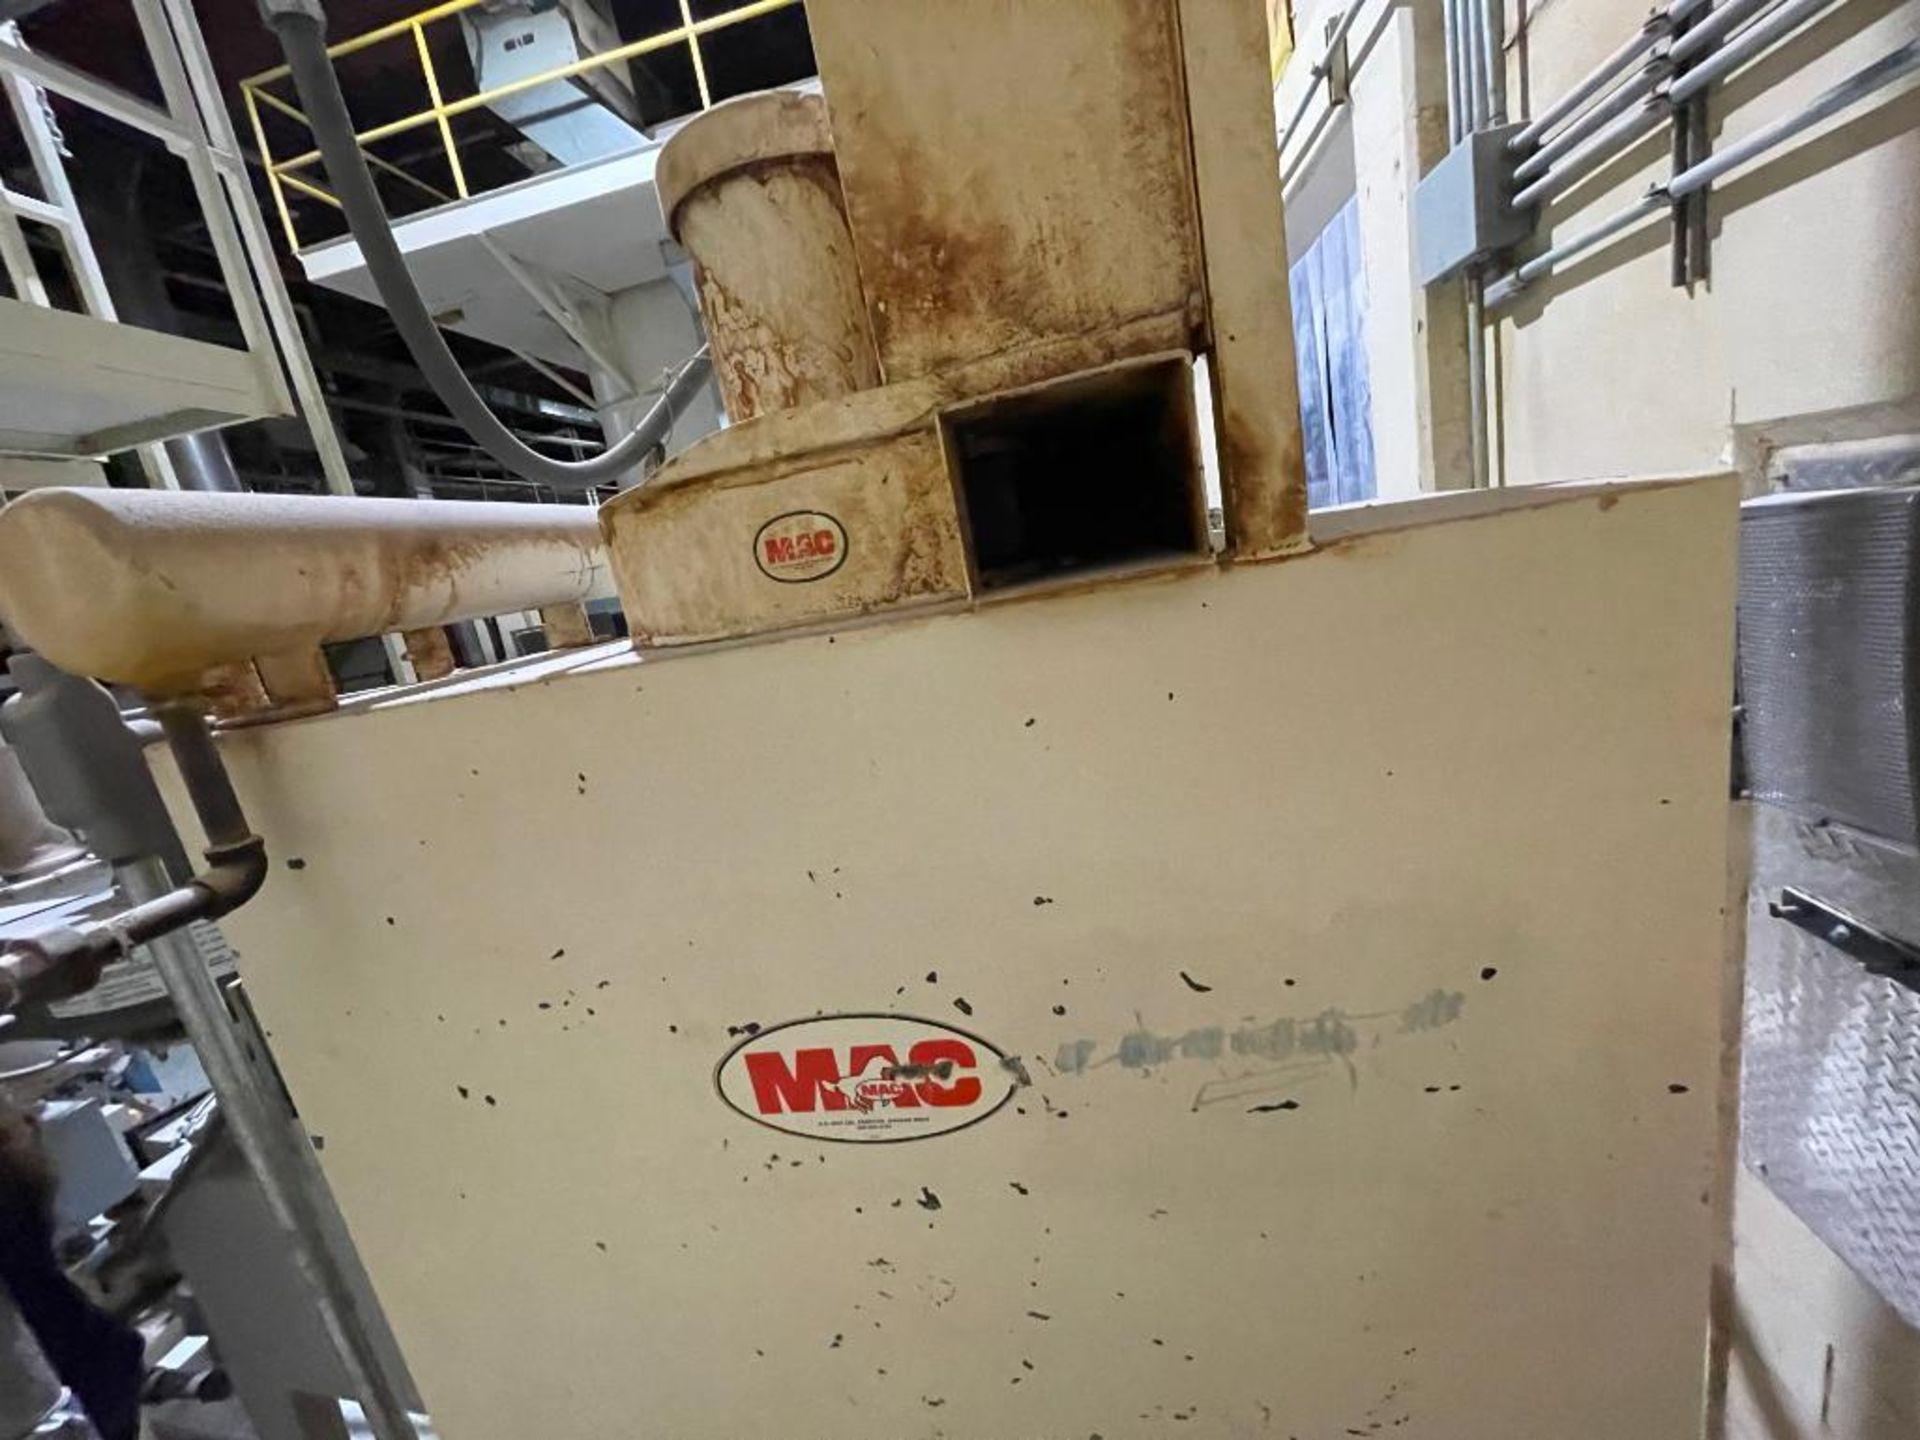 MAC dry ingredients dump station - Image 8 of 24